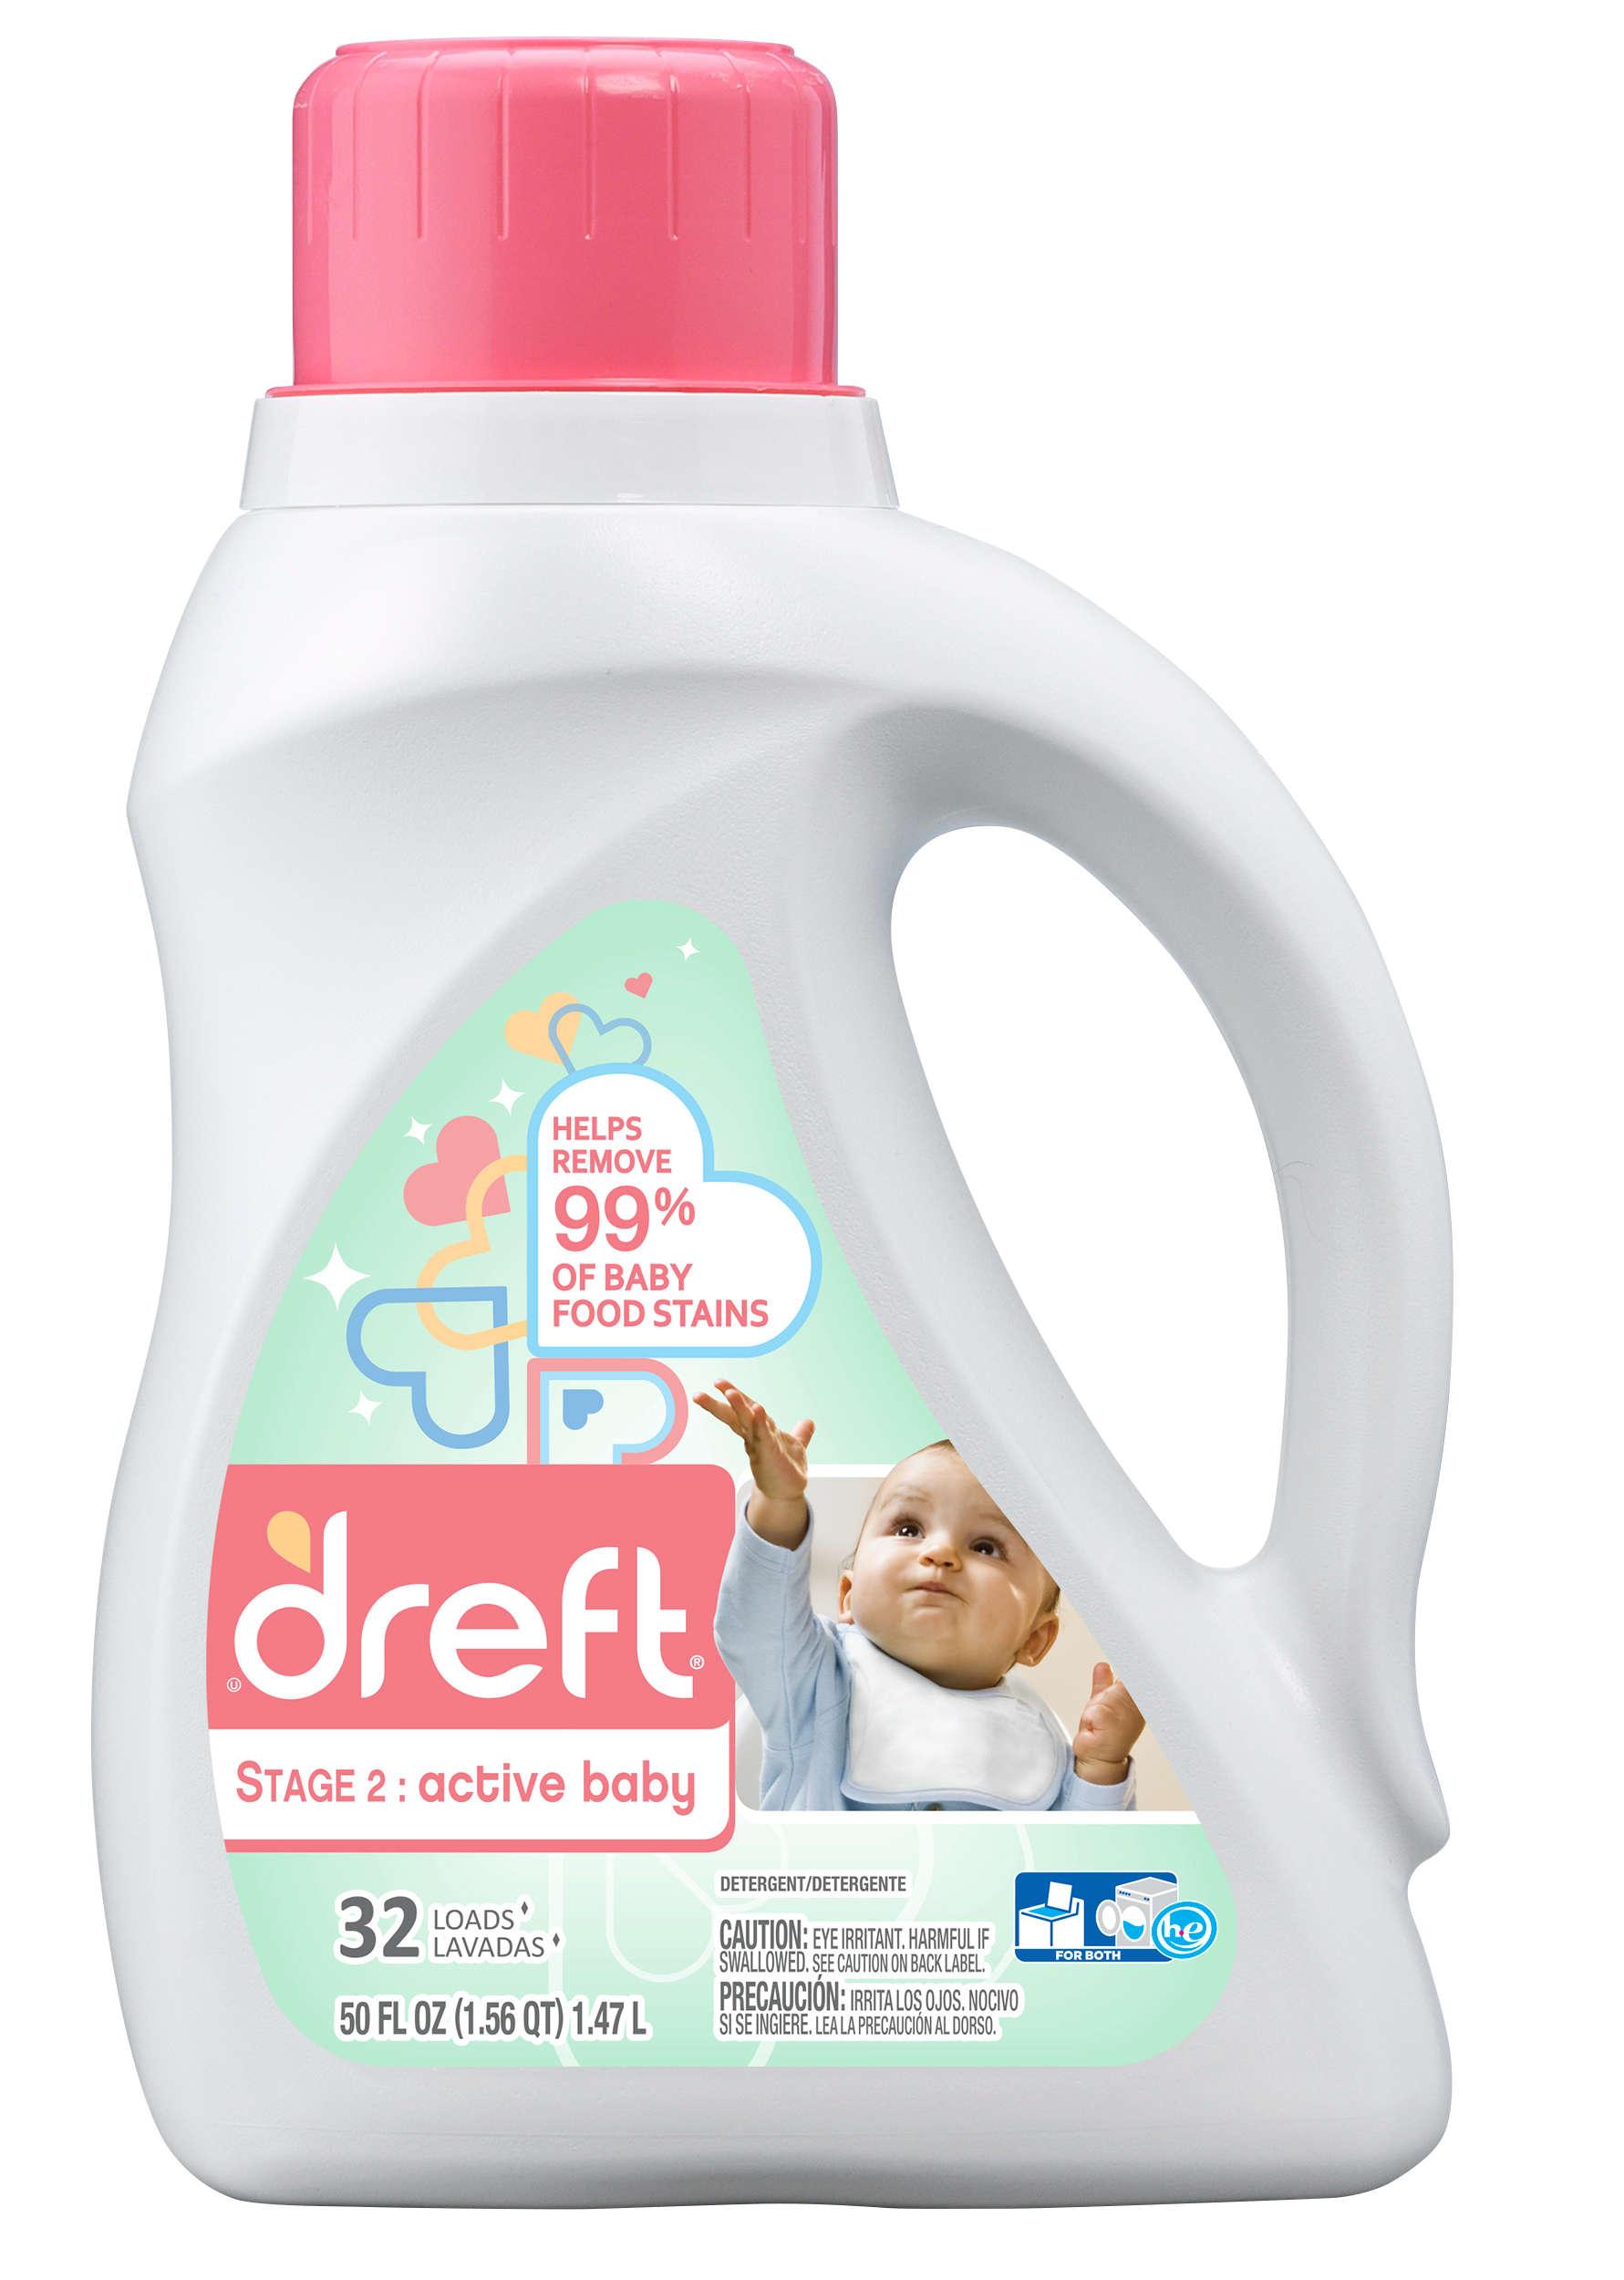 Dreft Stage 2: Active Baby Liquid Detergent